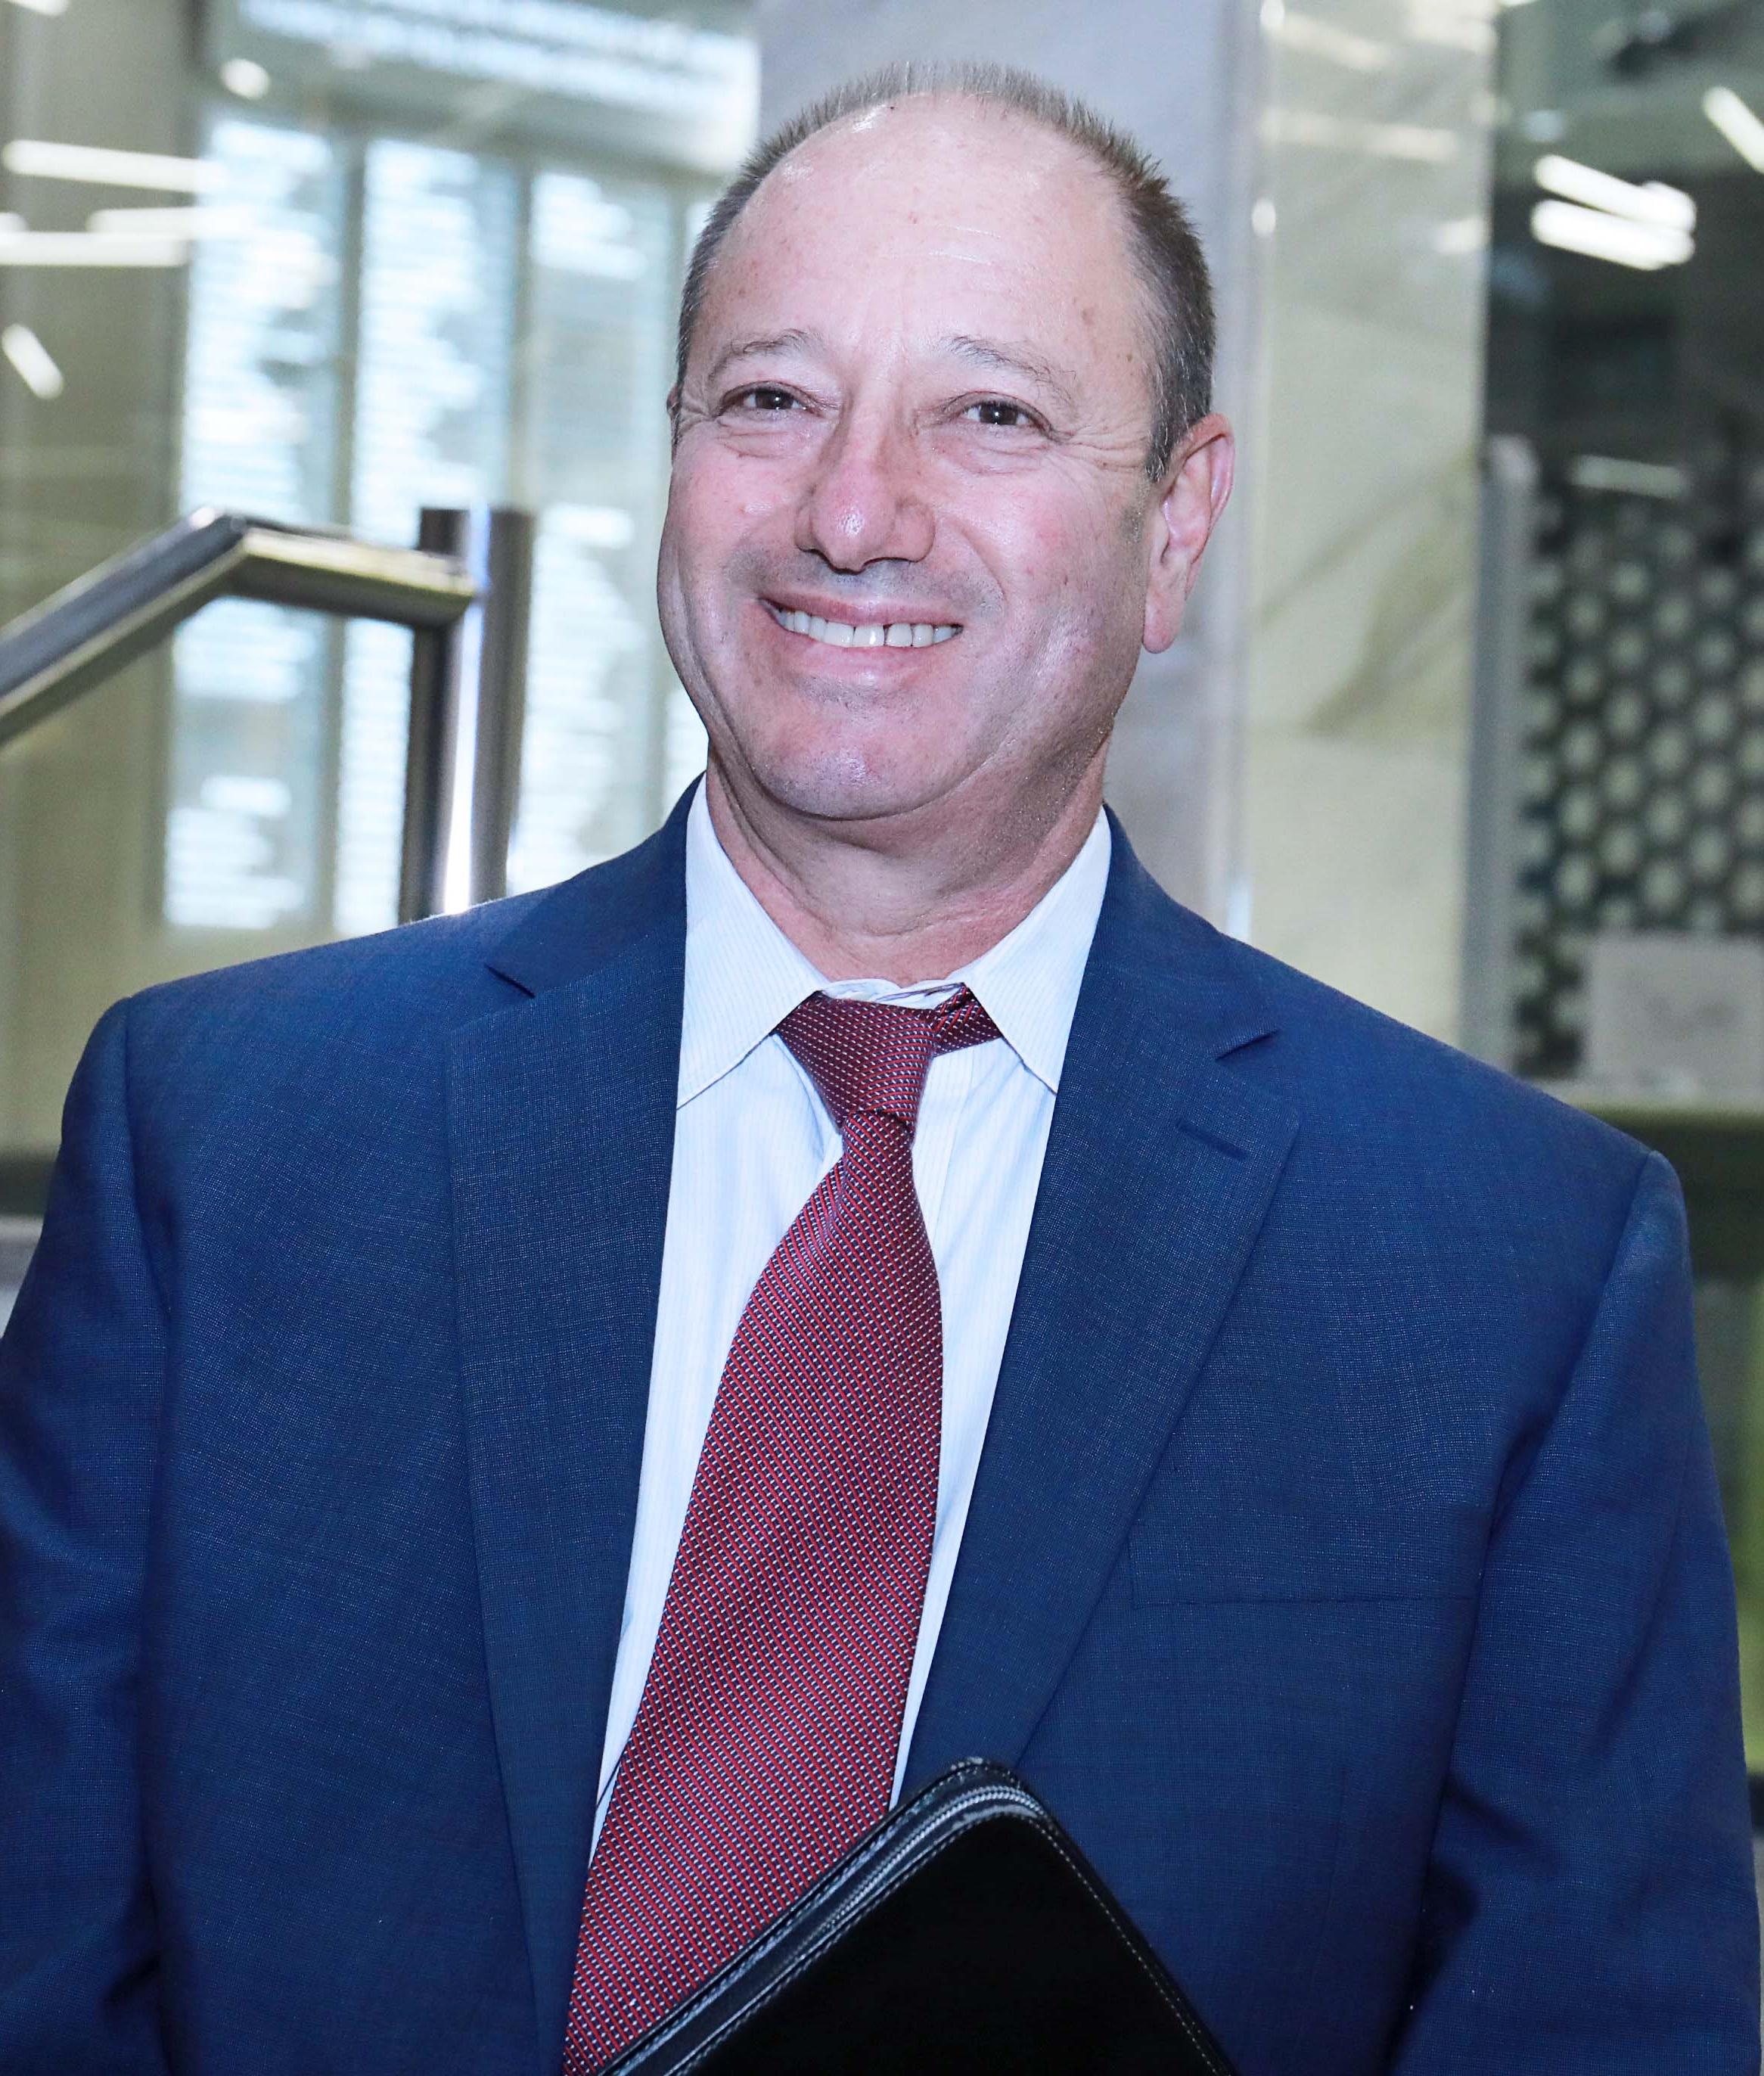 USAID Georgia Mission Director Visits AUA | AUA Newsroom